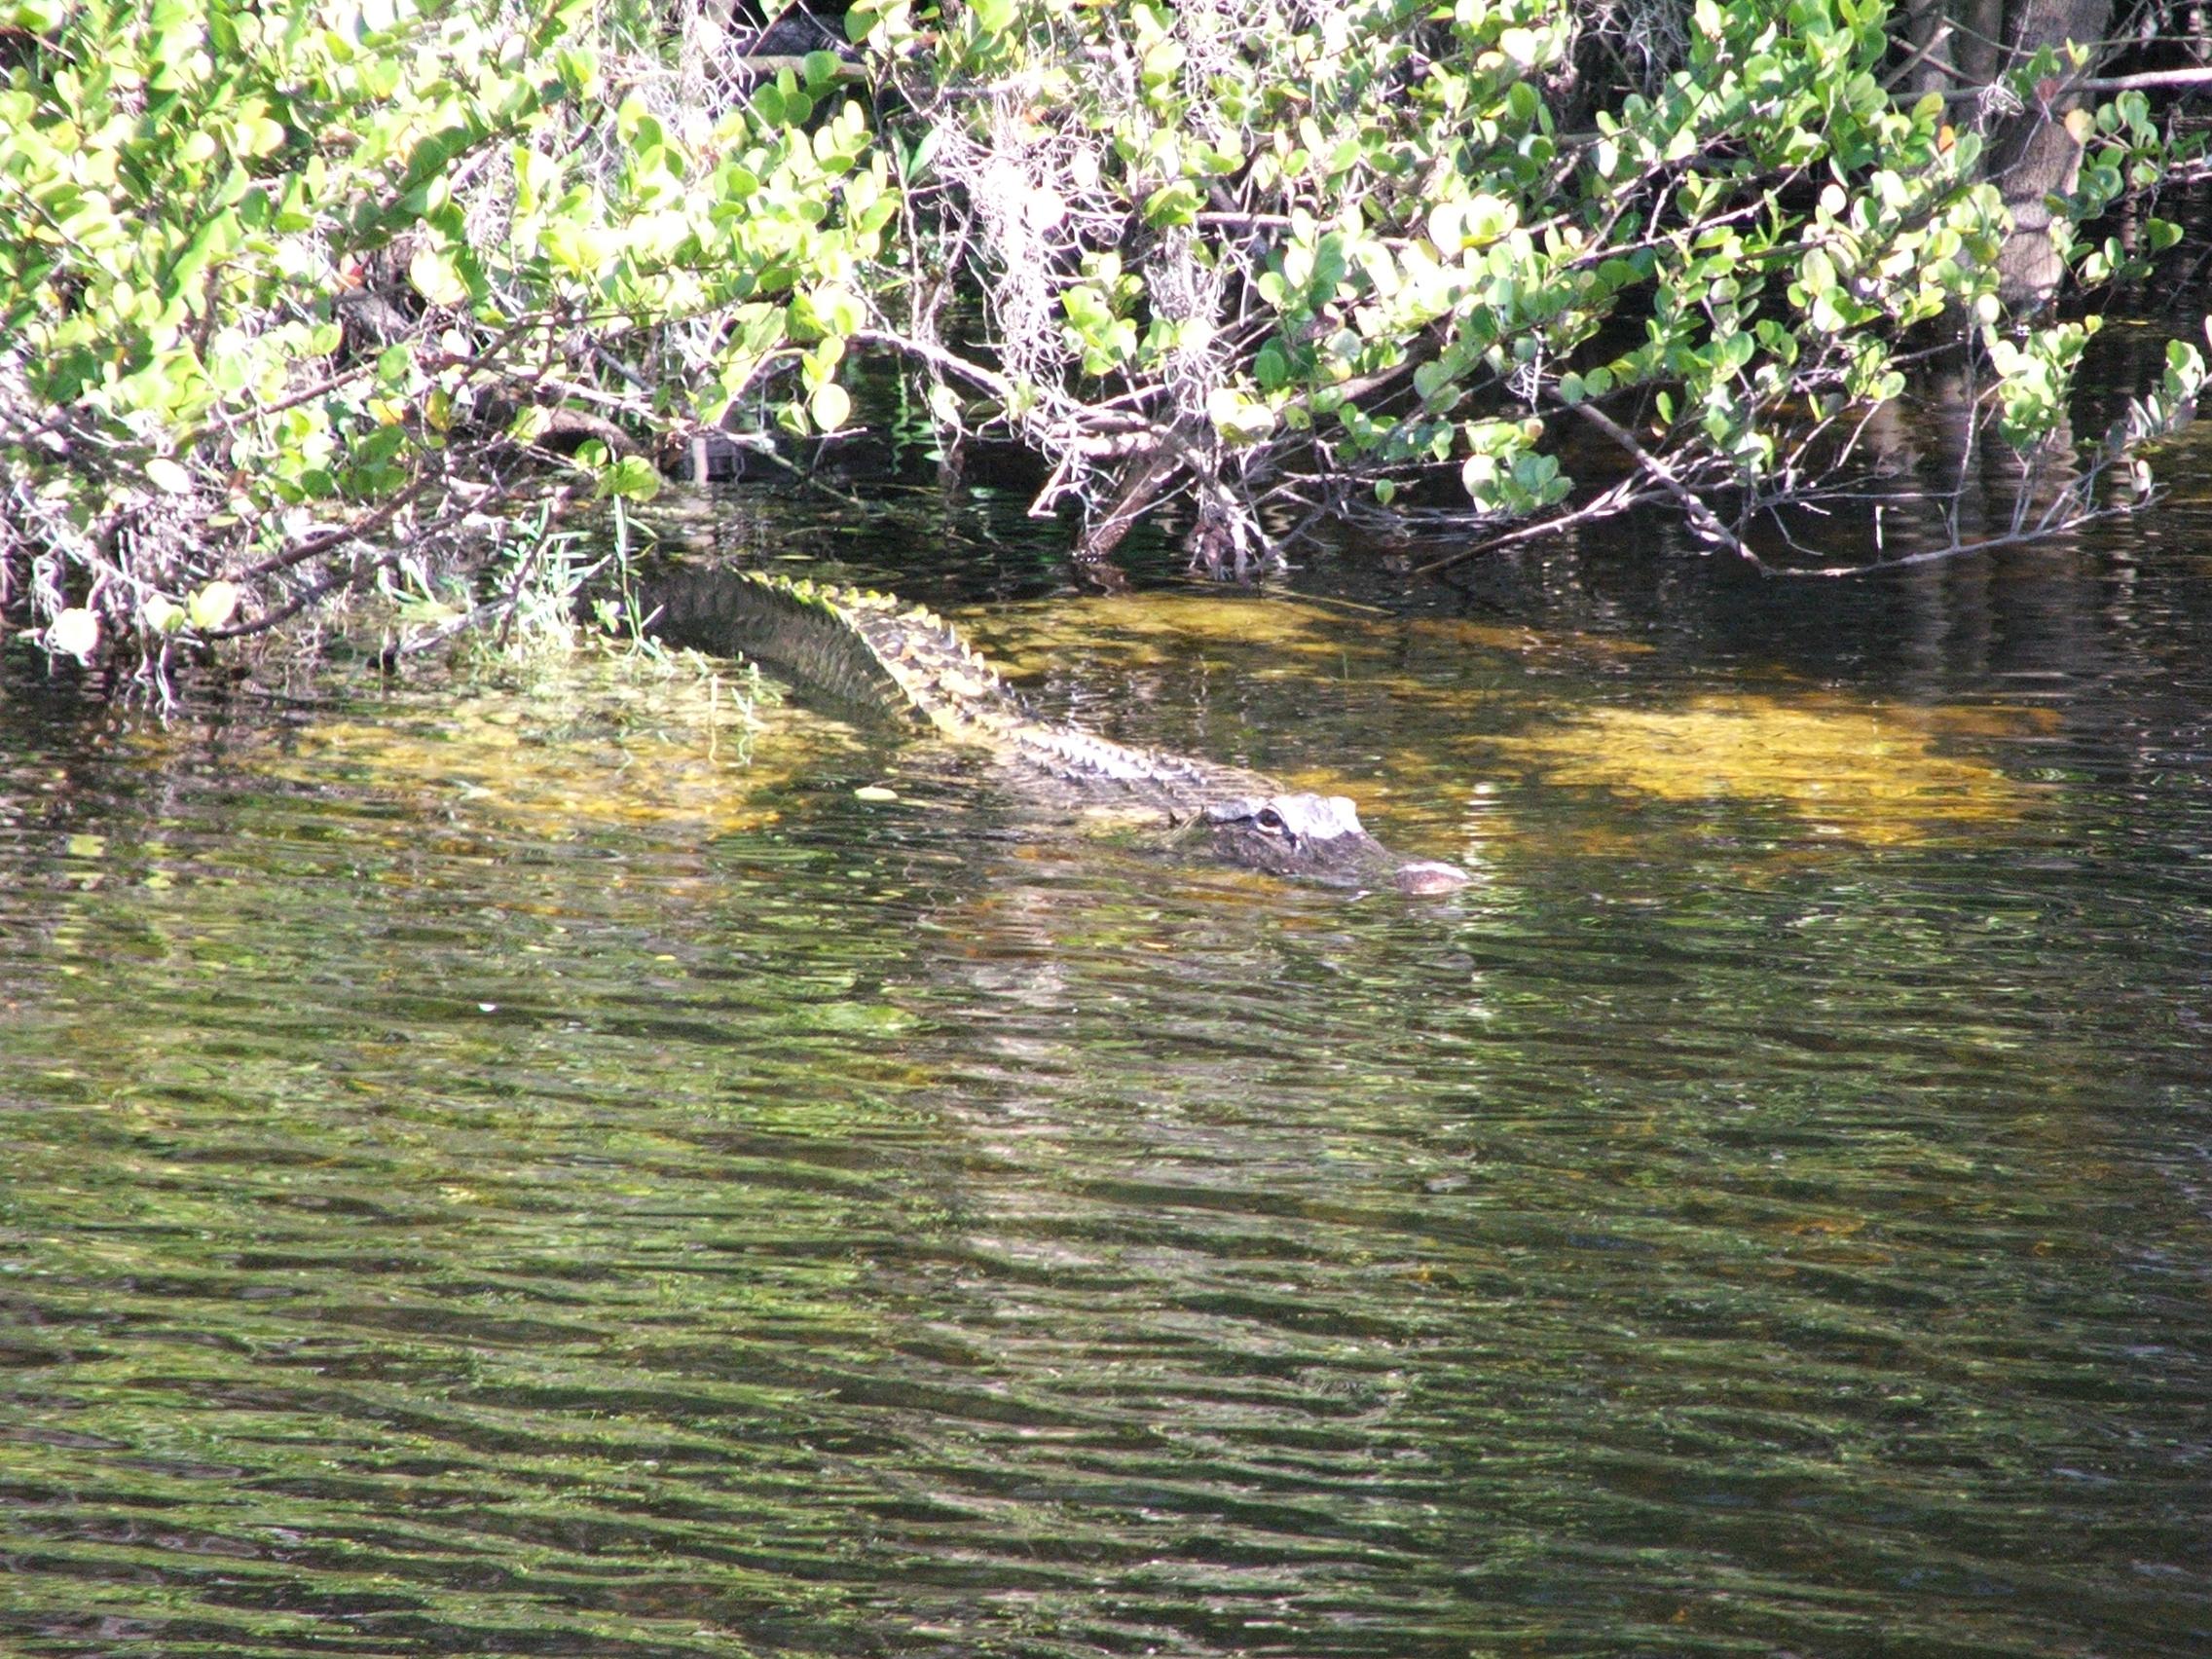 Everglades_US41-6016